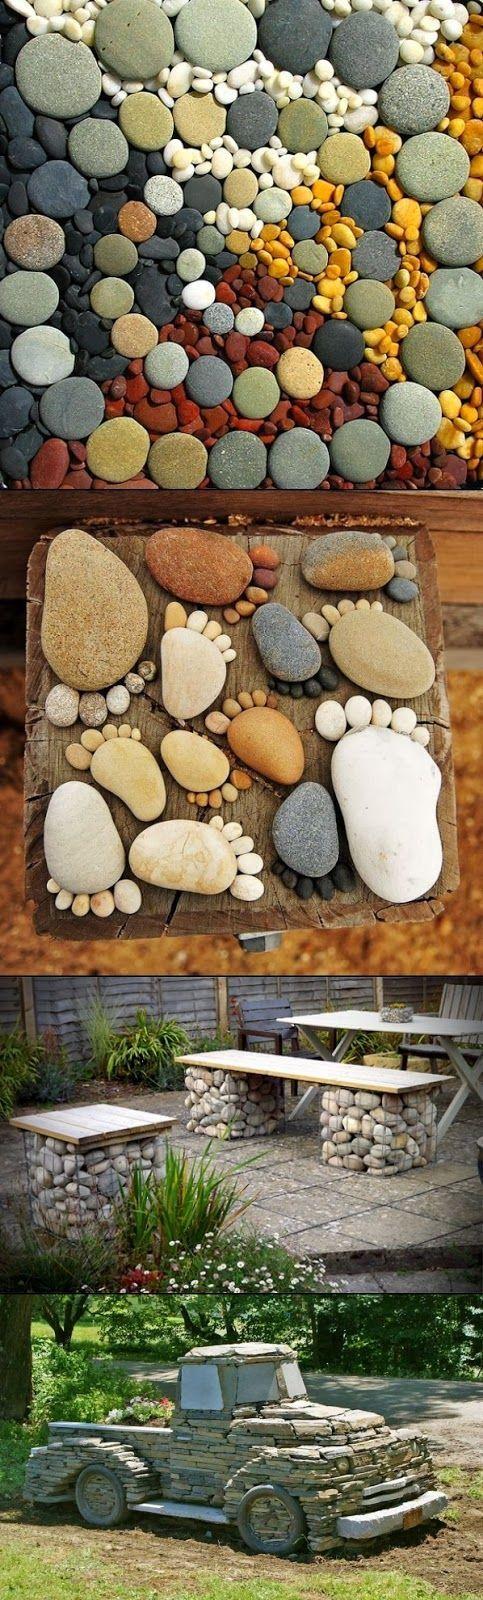 25 Amazing DIY Ideas How to Upgrade your Garden this Year DIY Home Decor #diy